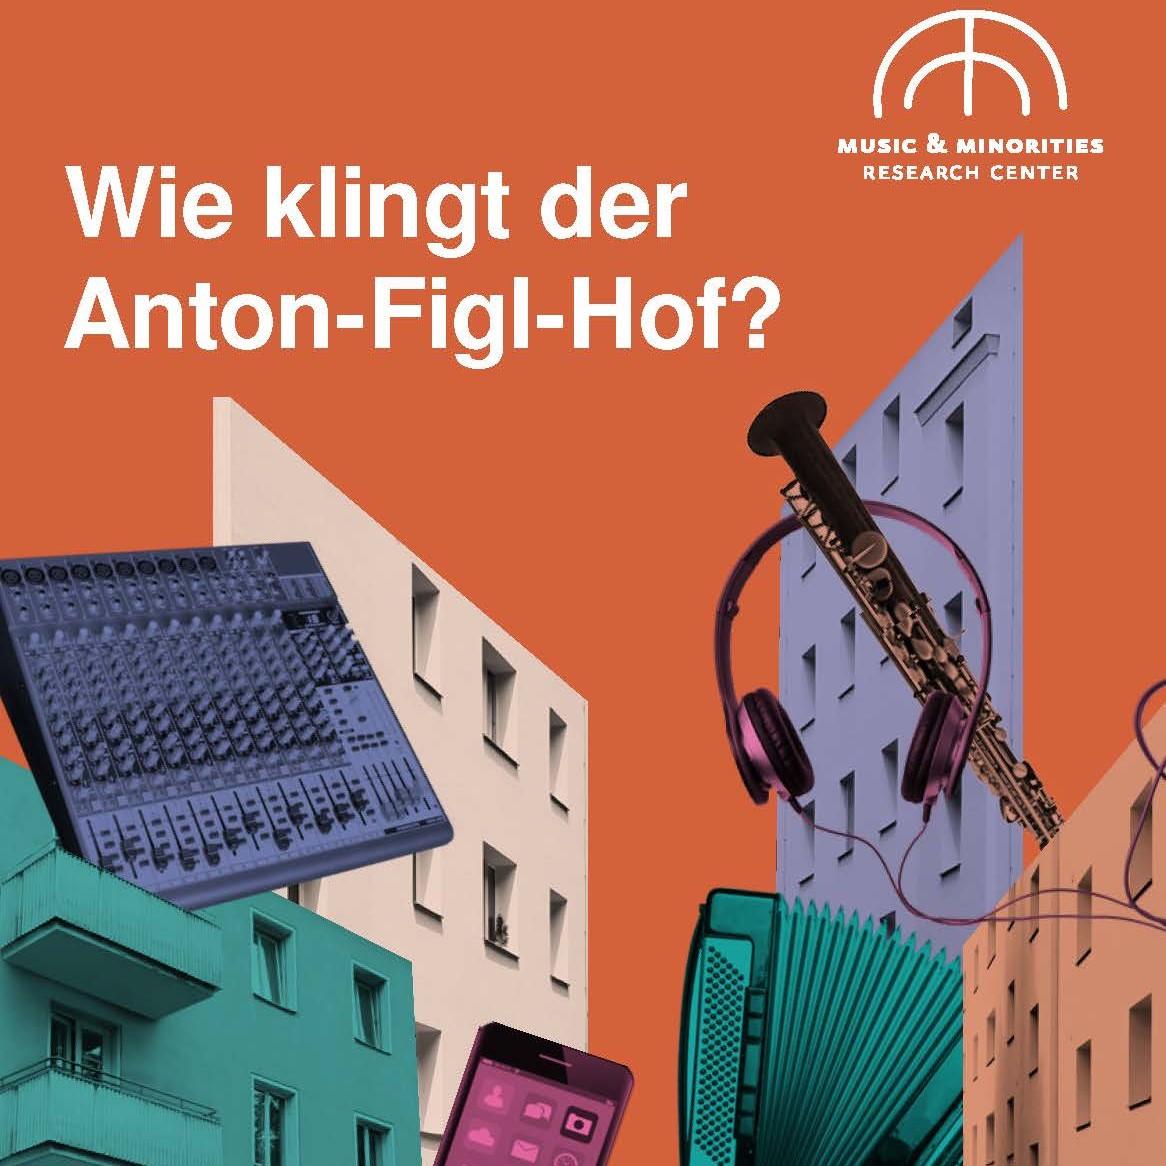 Wie klingt der Anton-Figl-Hof?